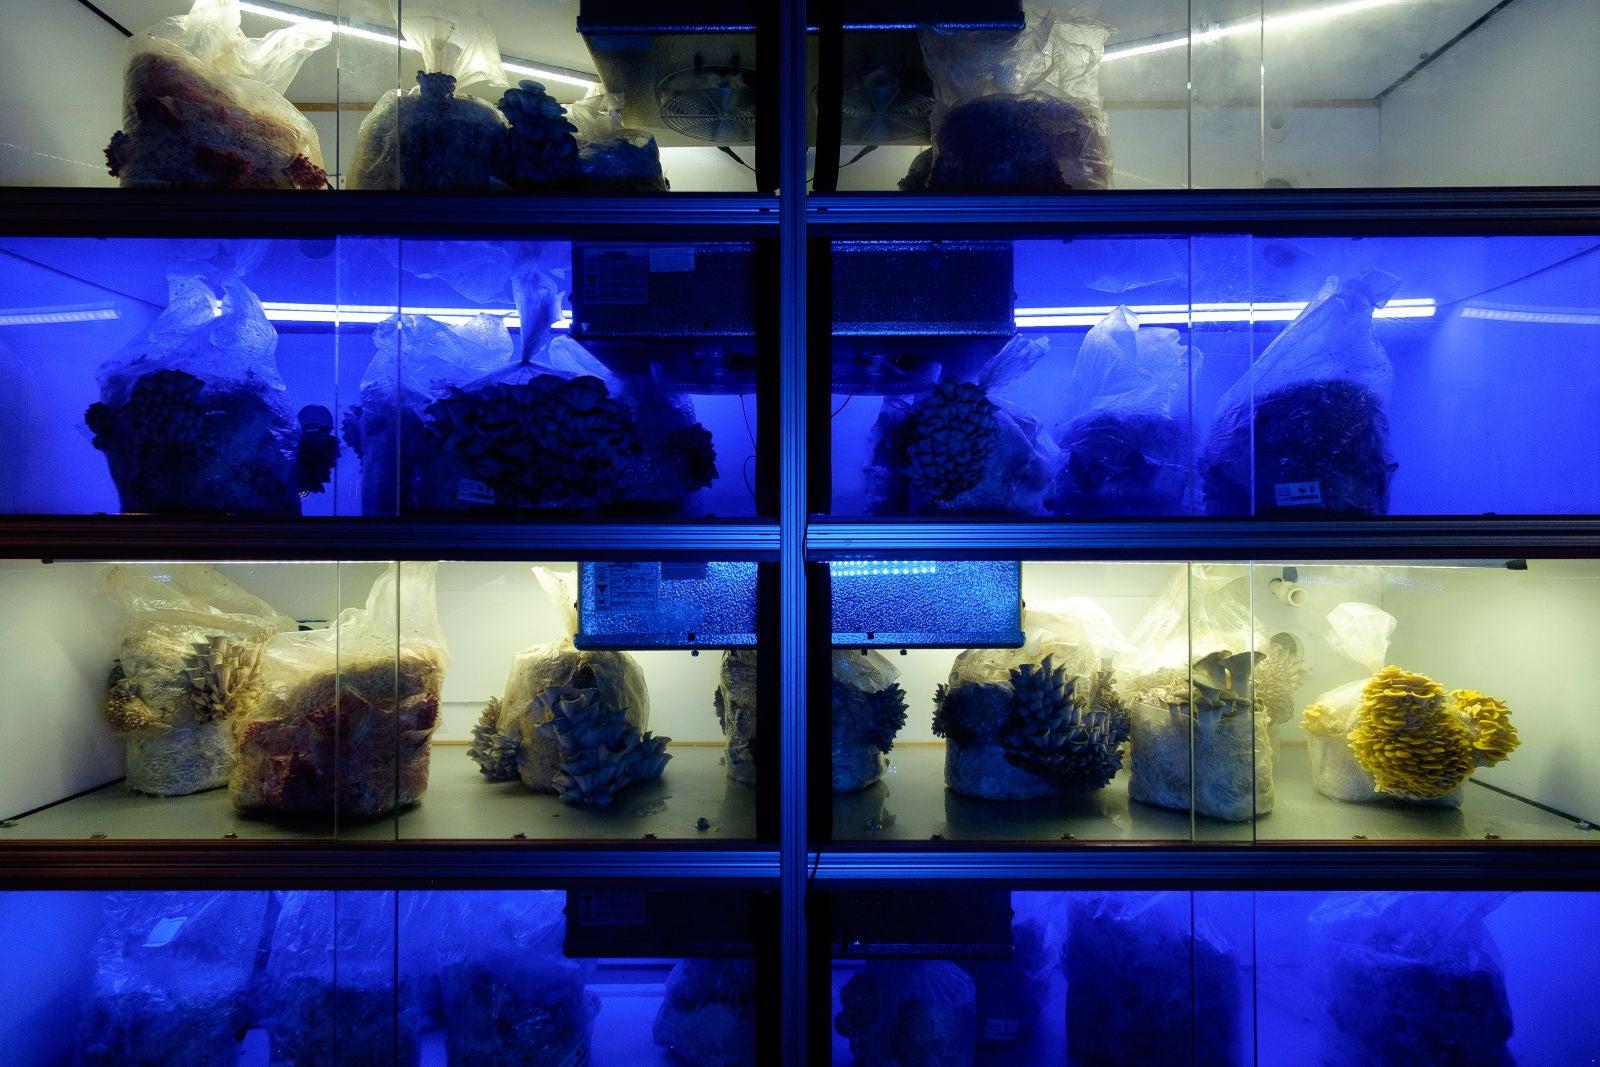 A Fleet Of Networked Mushroom Farms Is Spreading Across New York